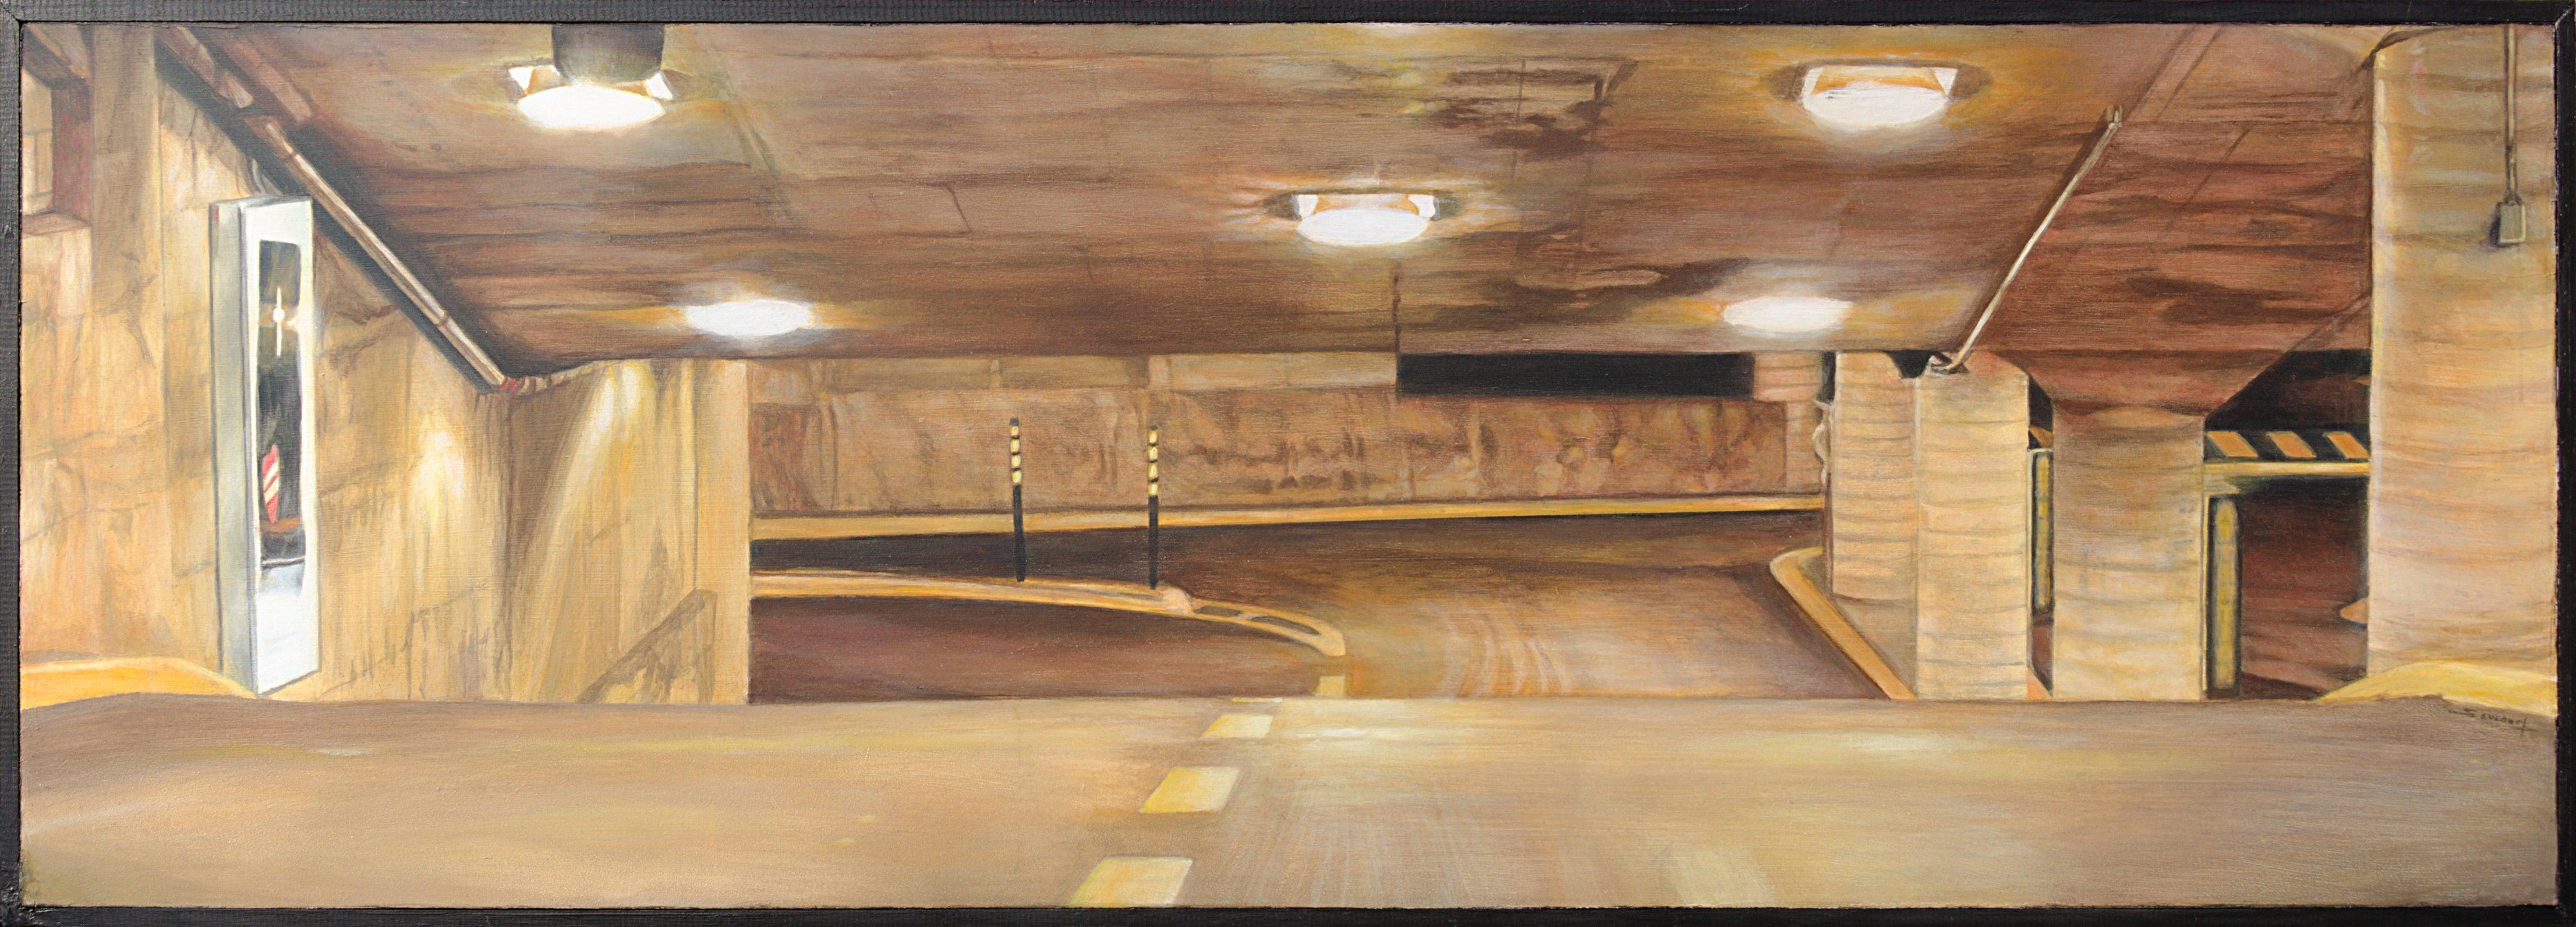 """The Cave"", Underground Parking Horizontal Urban Landscape Acrylic Painting"